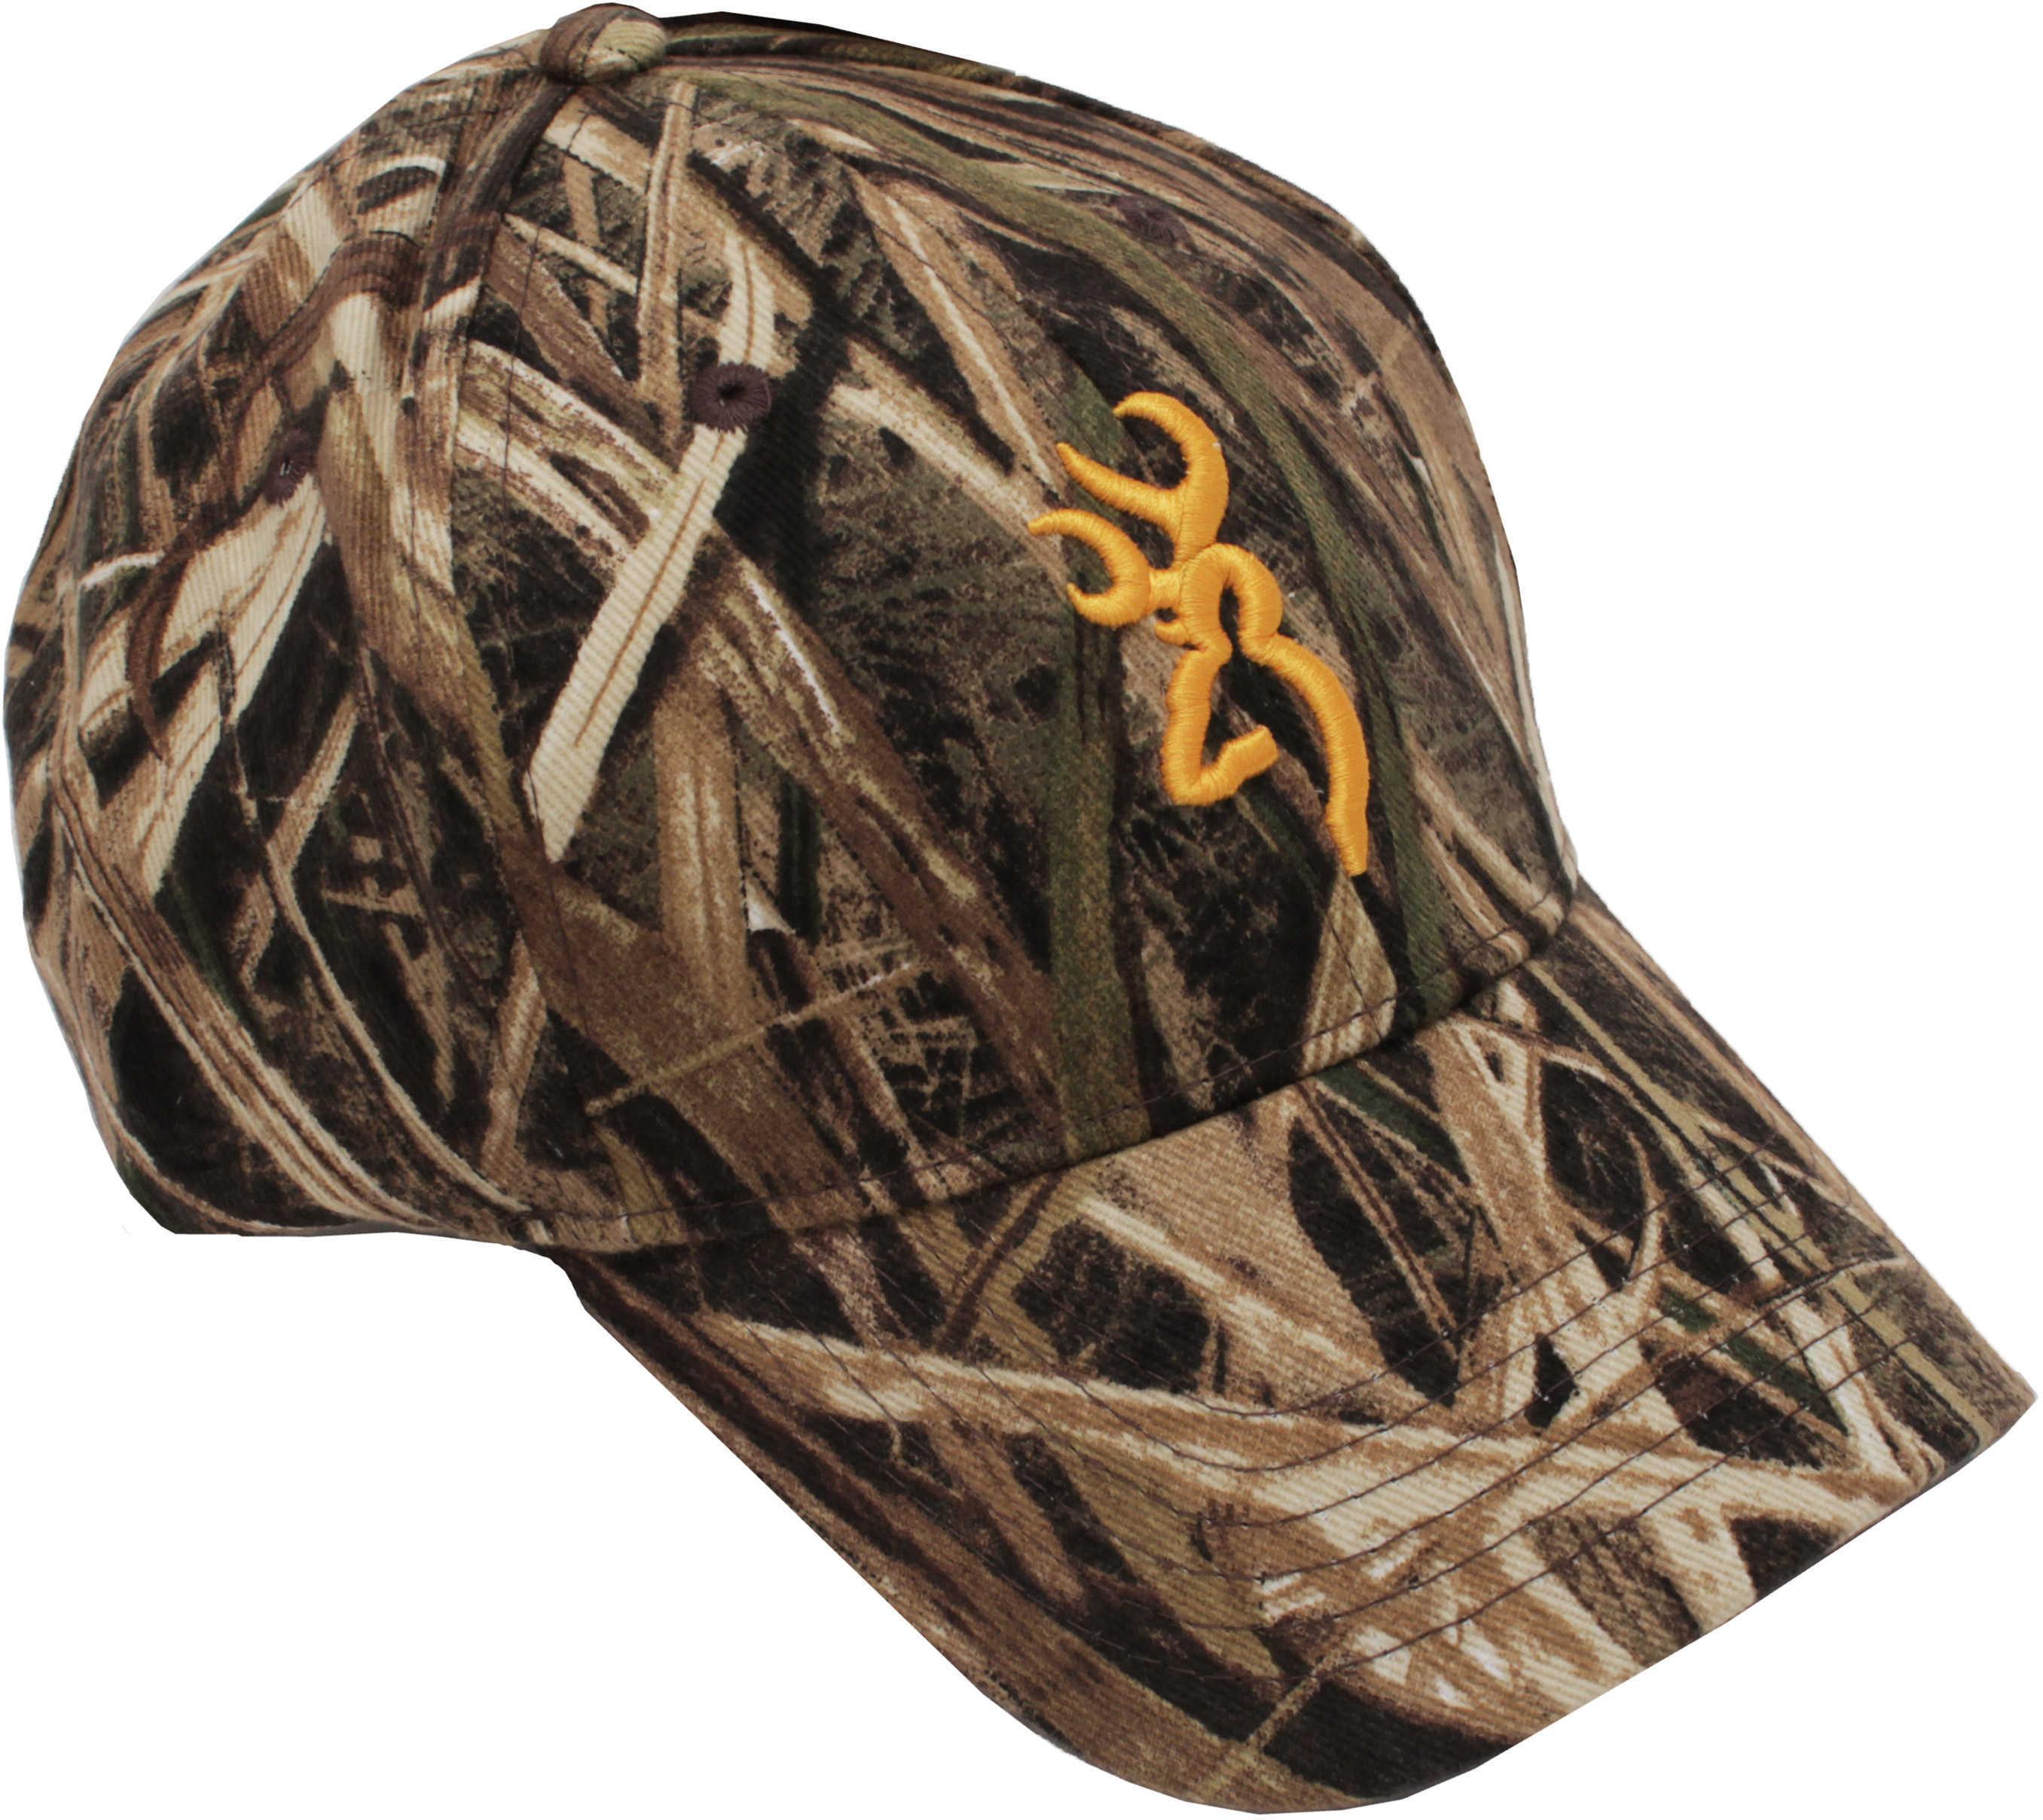 Browning Rimfire 3D Buckmark Cap Mossy Oak Grass Blades Md: 308379251